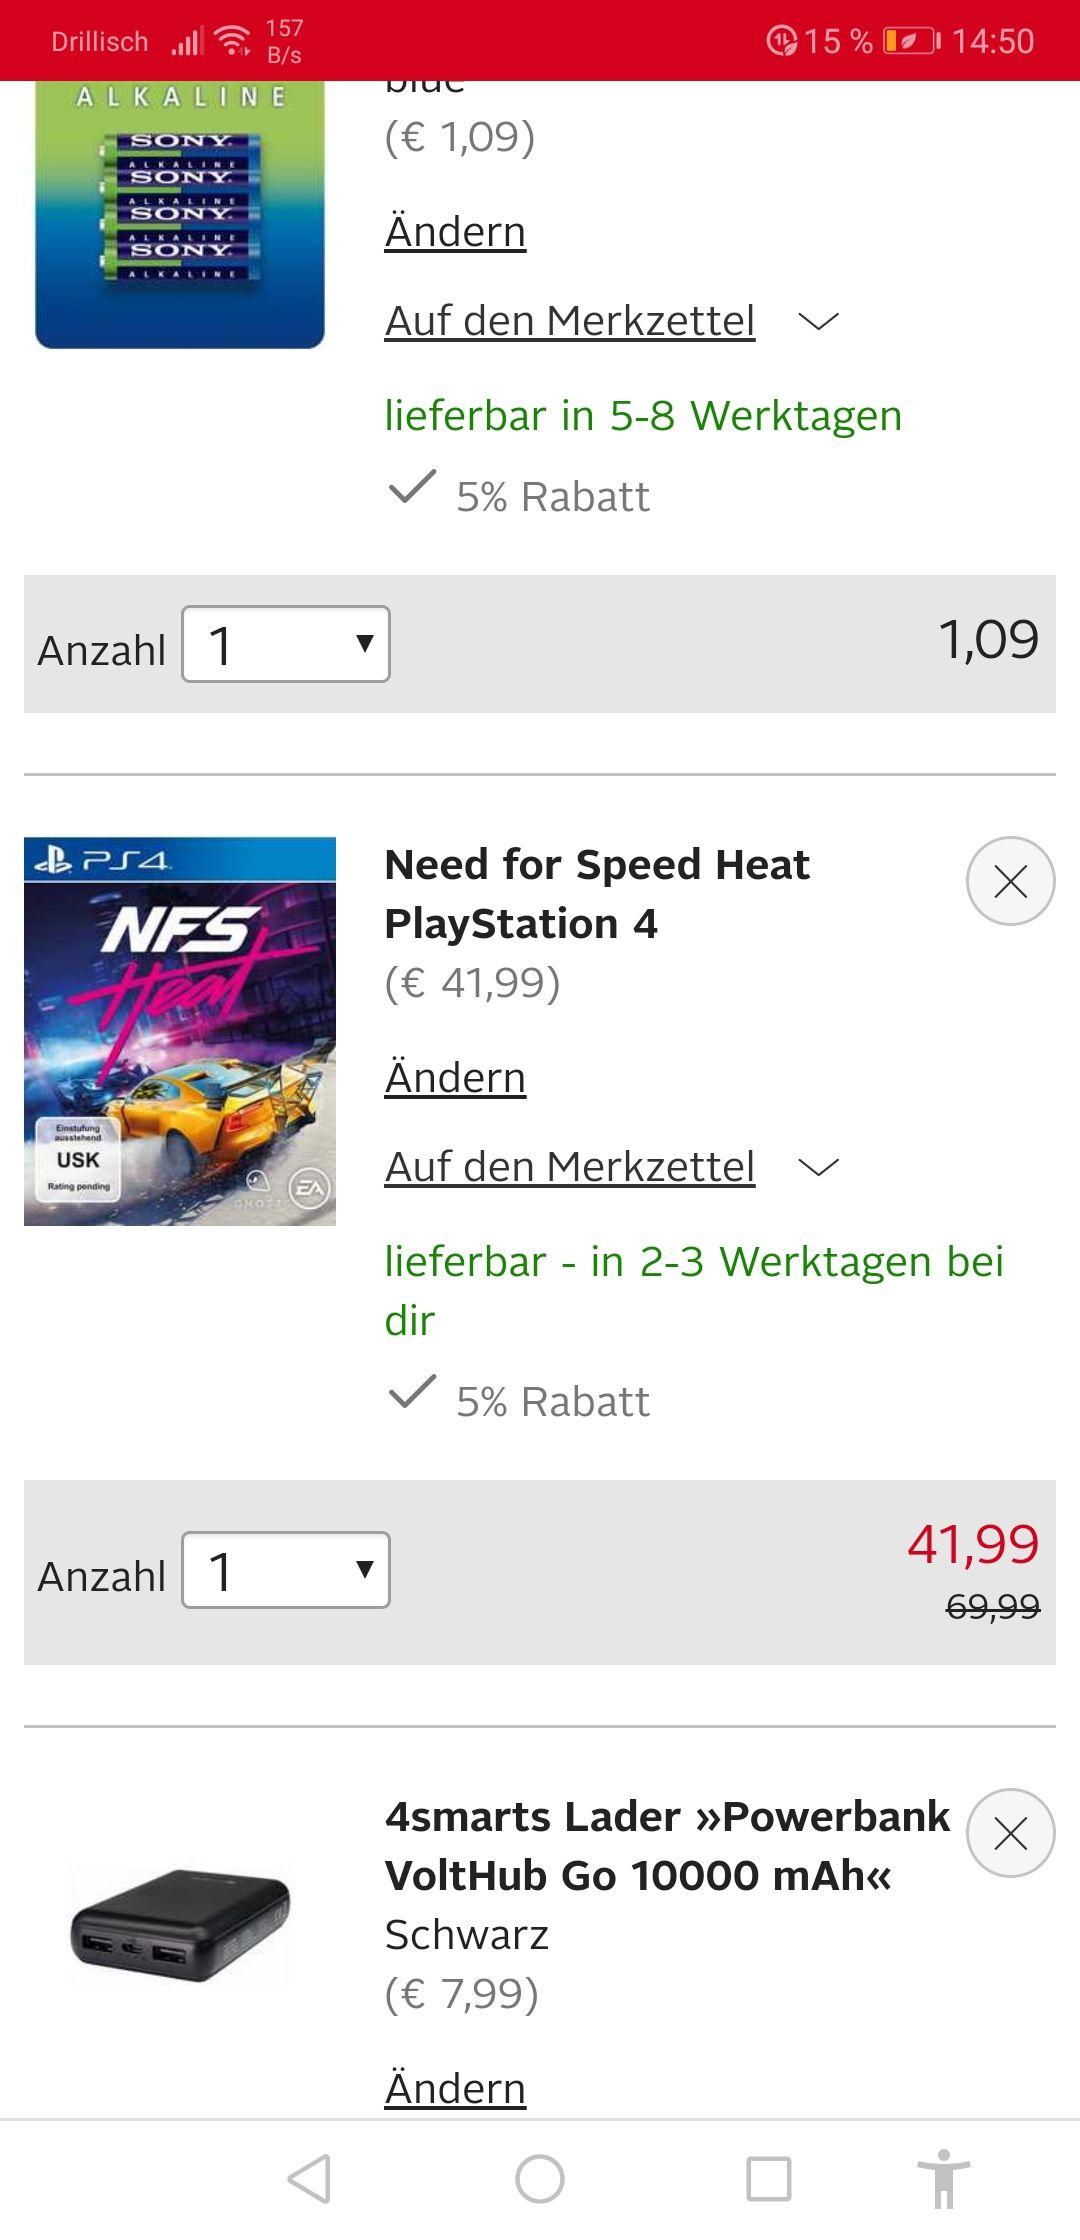 Need for speed heat ps4 plus powerbank +Neukundenrabatt